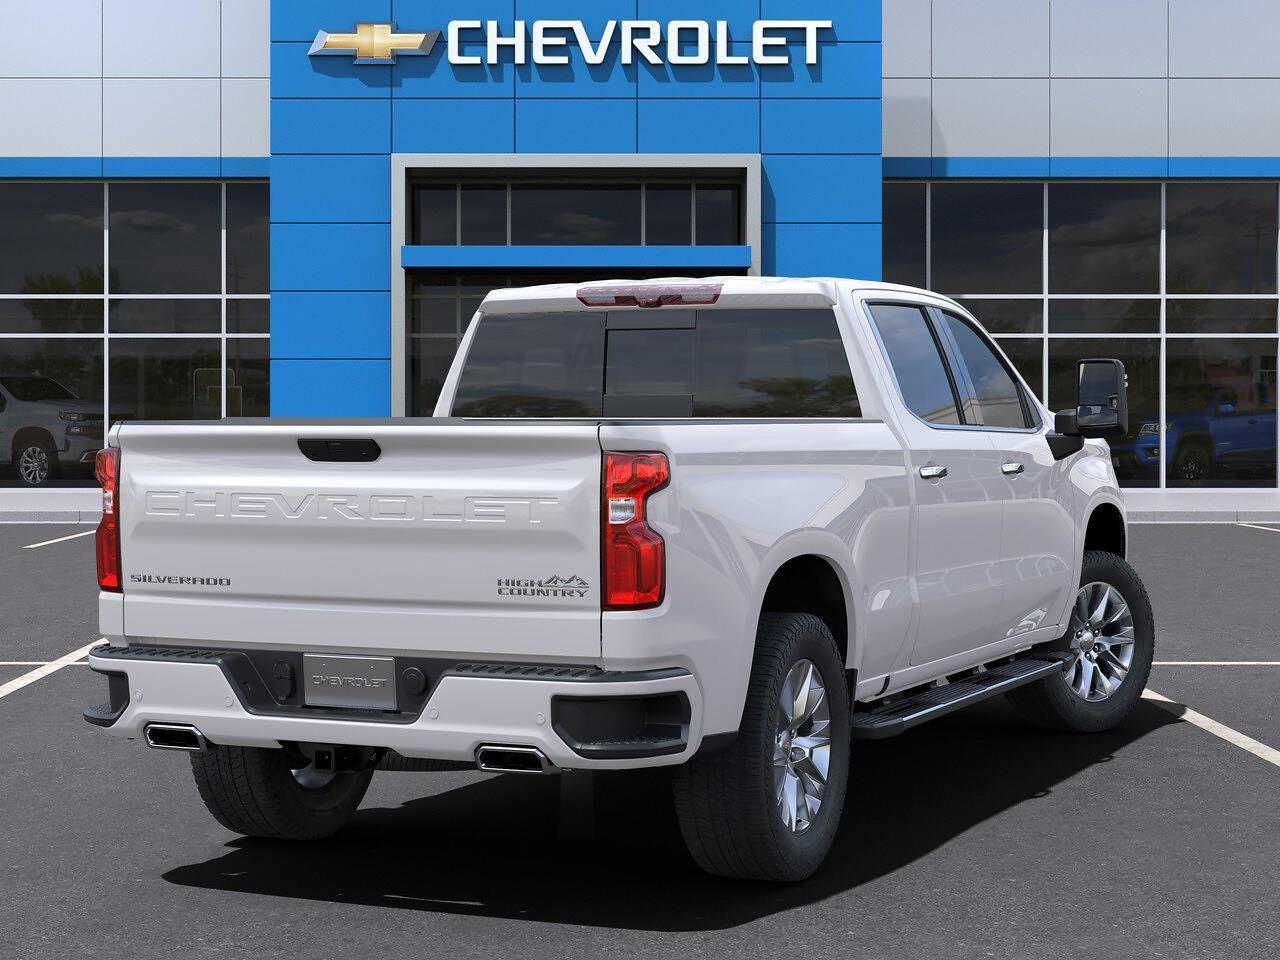 2021 Chevrolet Silverado 1500 Crew Cab 4x4, Pickup #CT21120 - photo 1